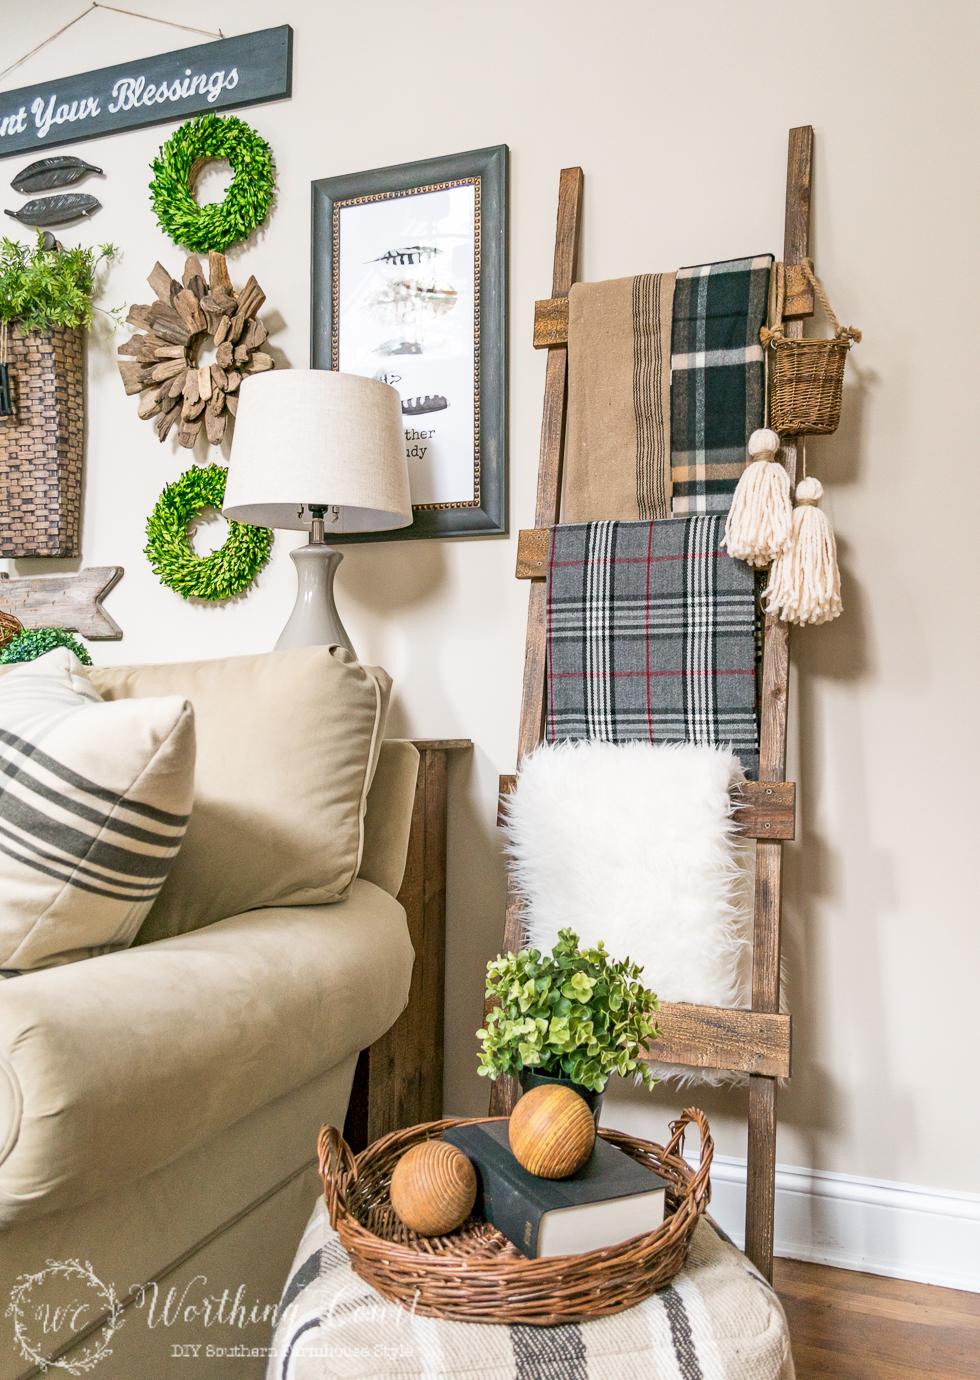 diy rustic decorative ladder - Diy Home Design Ideas